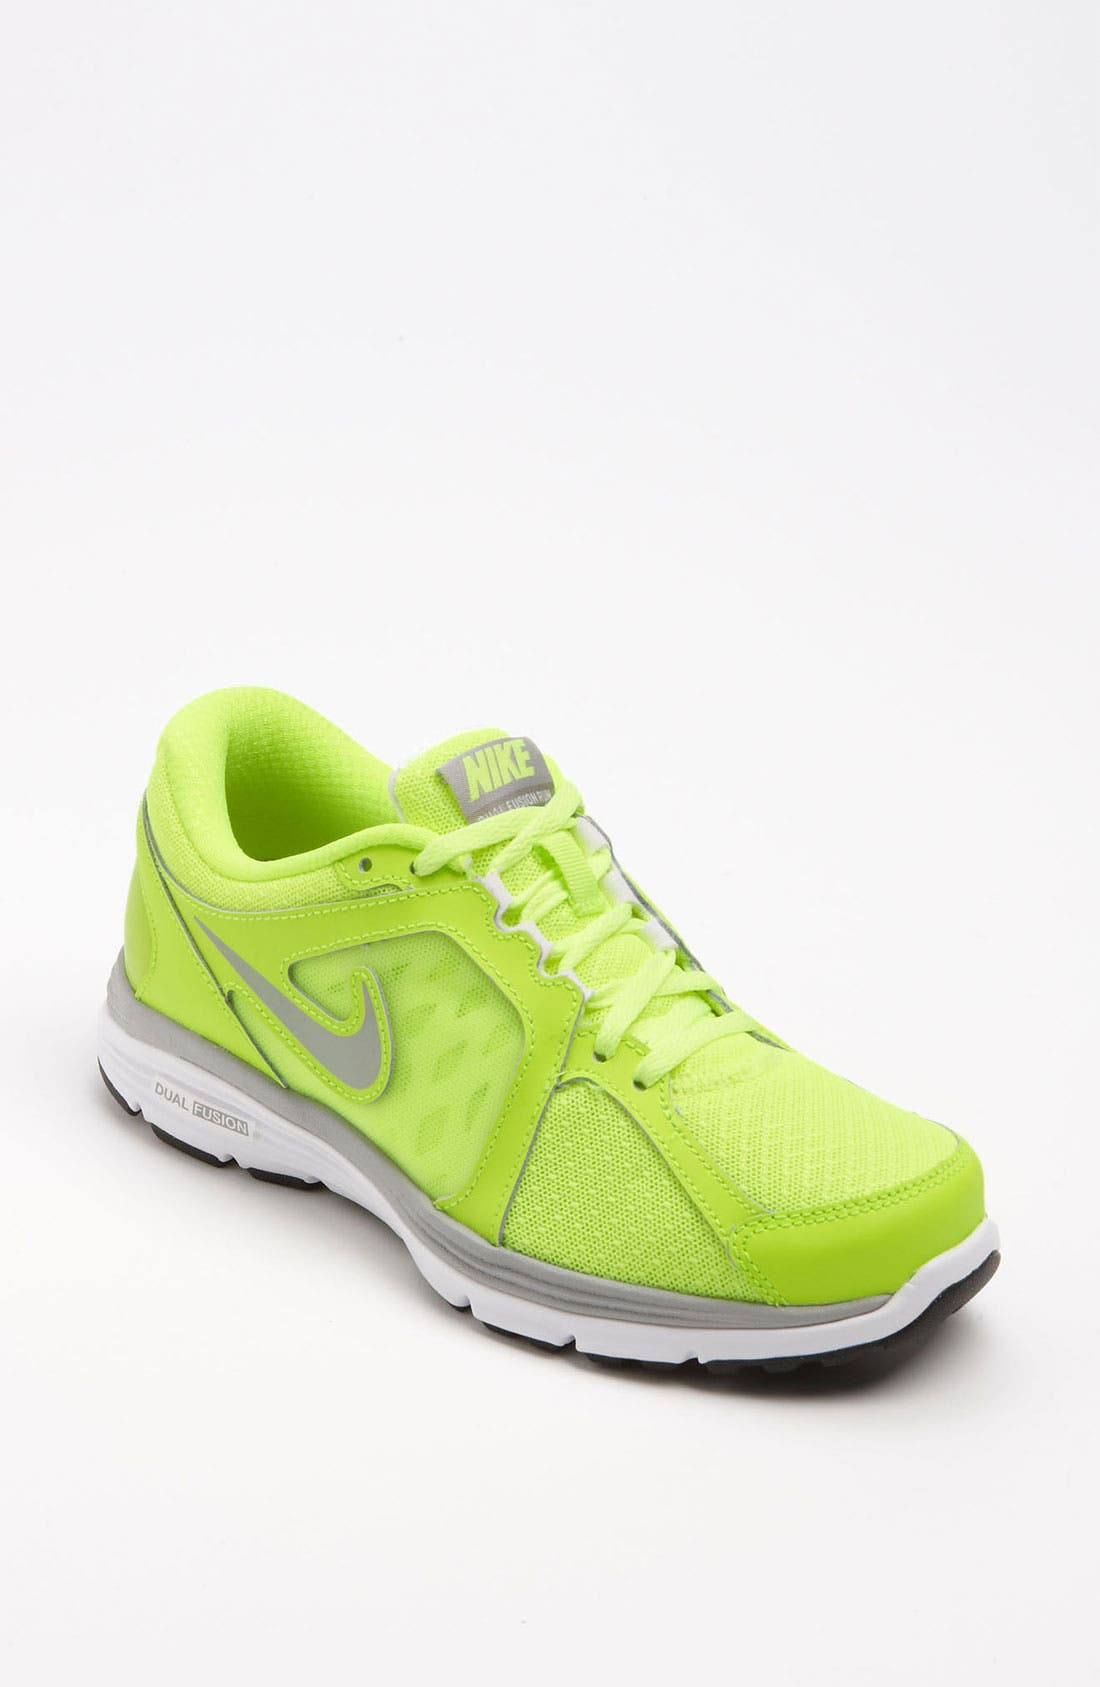 Alternate Image 1 Selected - Nike 'Dual Fusion 3' Running Shoe (Women)